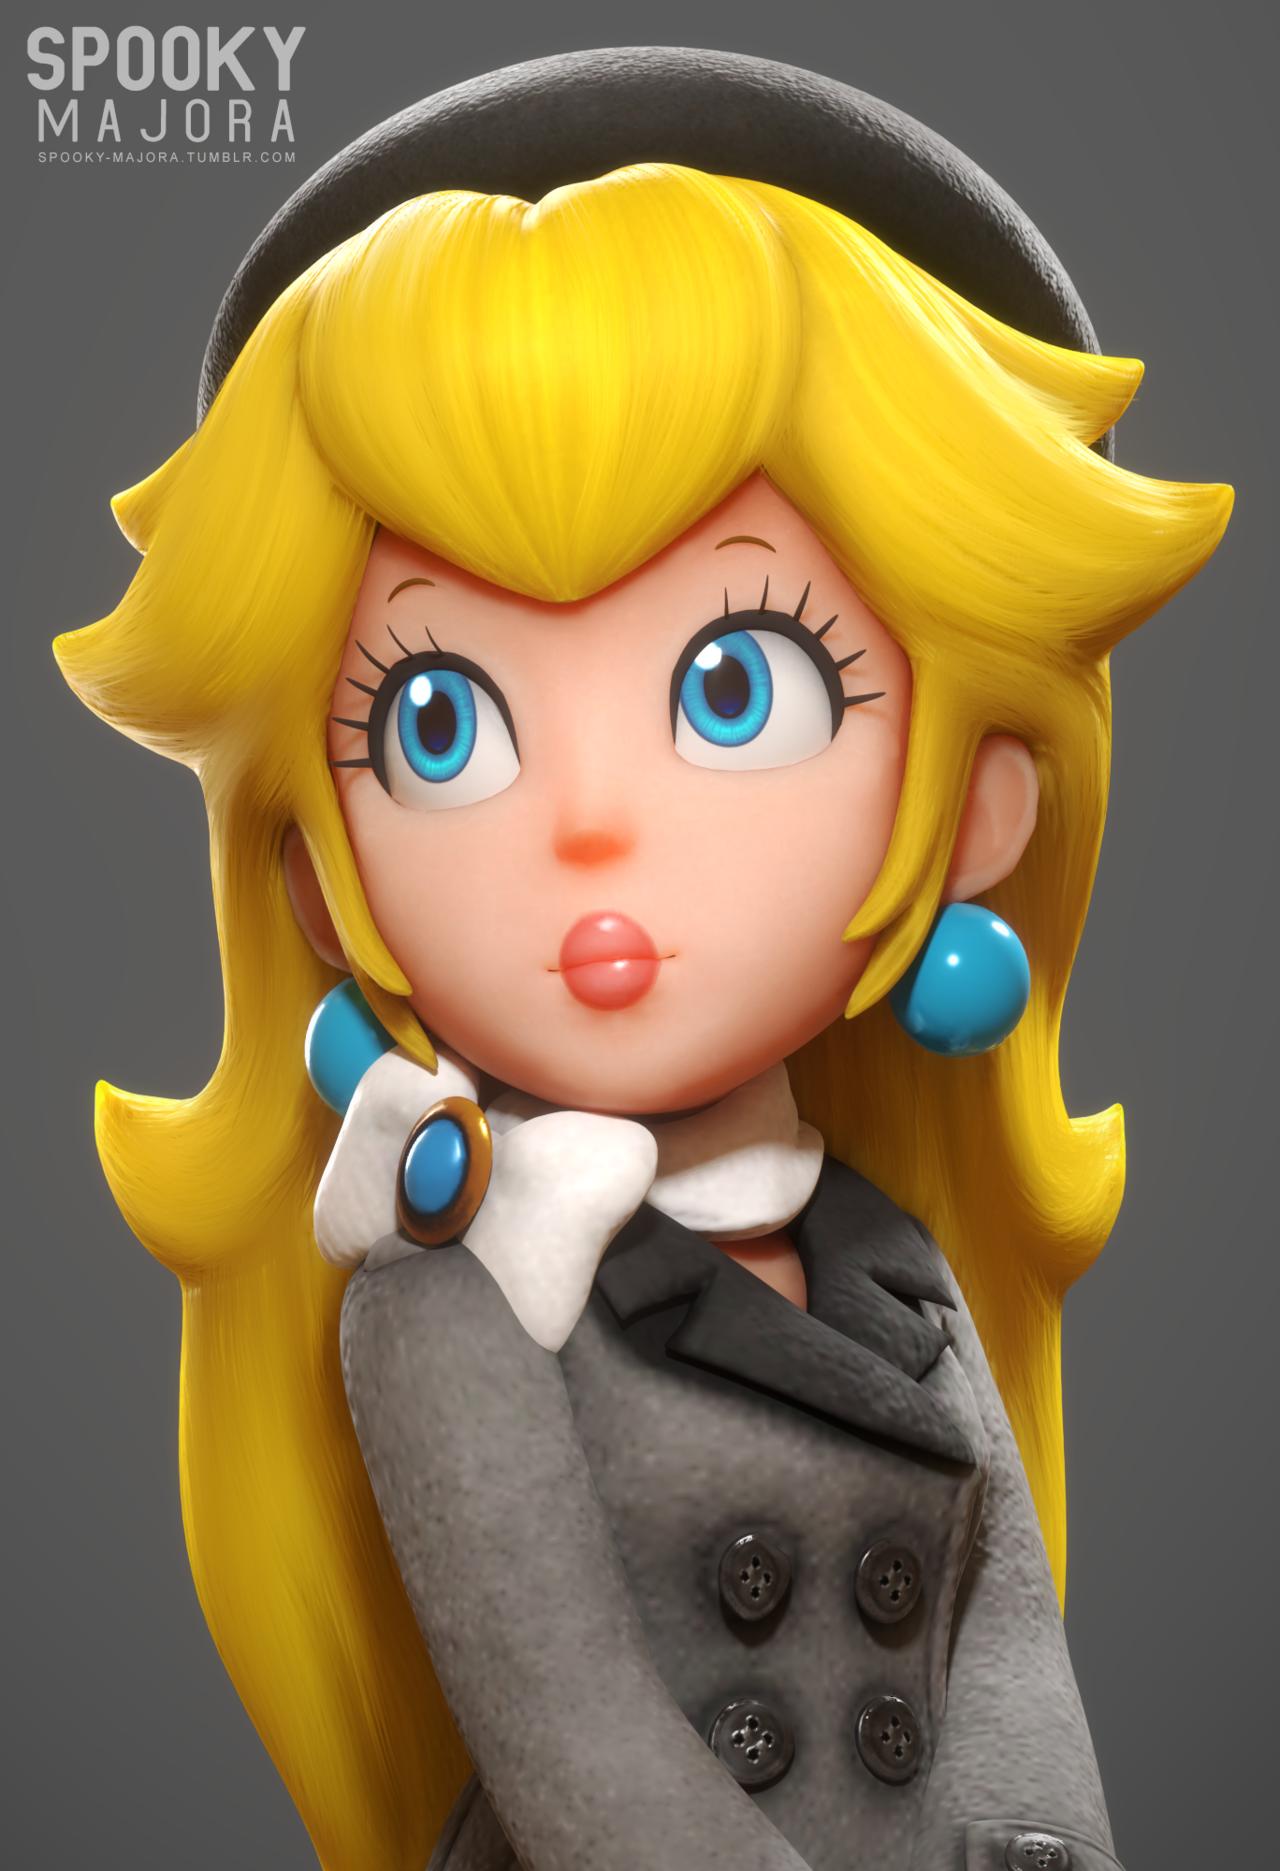 Princess Peach Photo In 2020 Super Mario Art Super Princess Peach Super Mario Princess